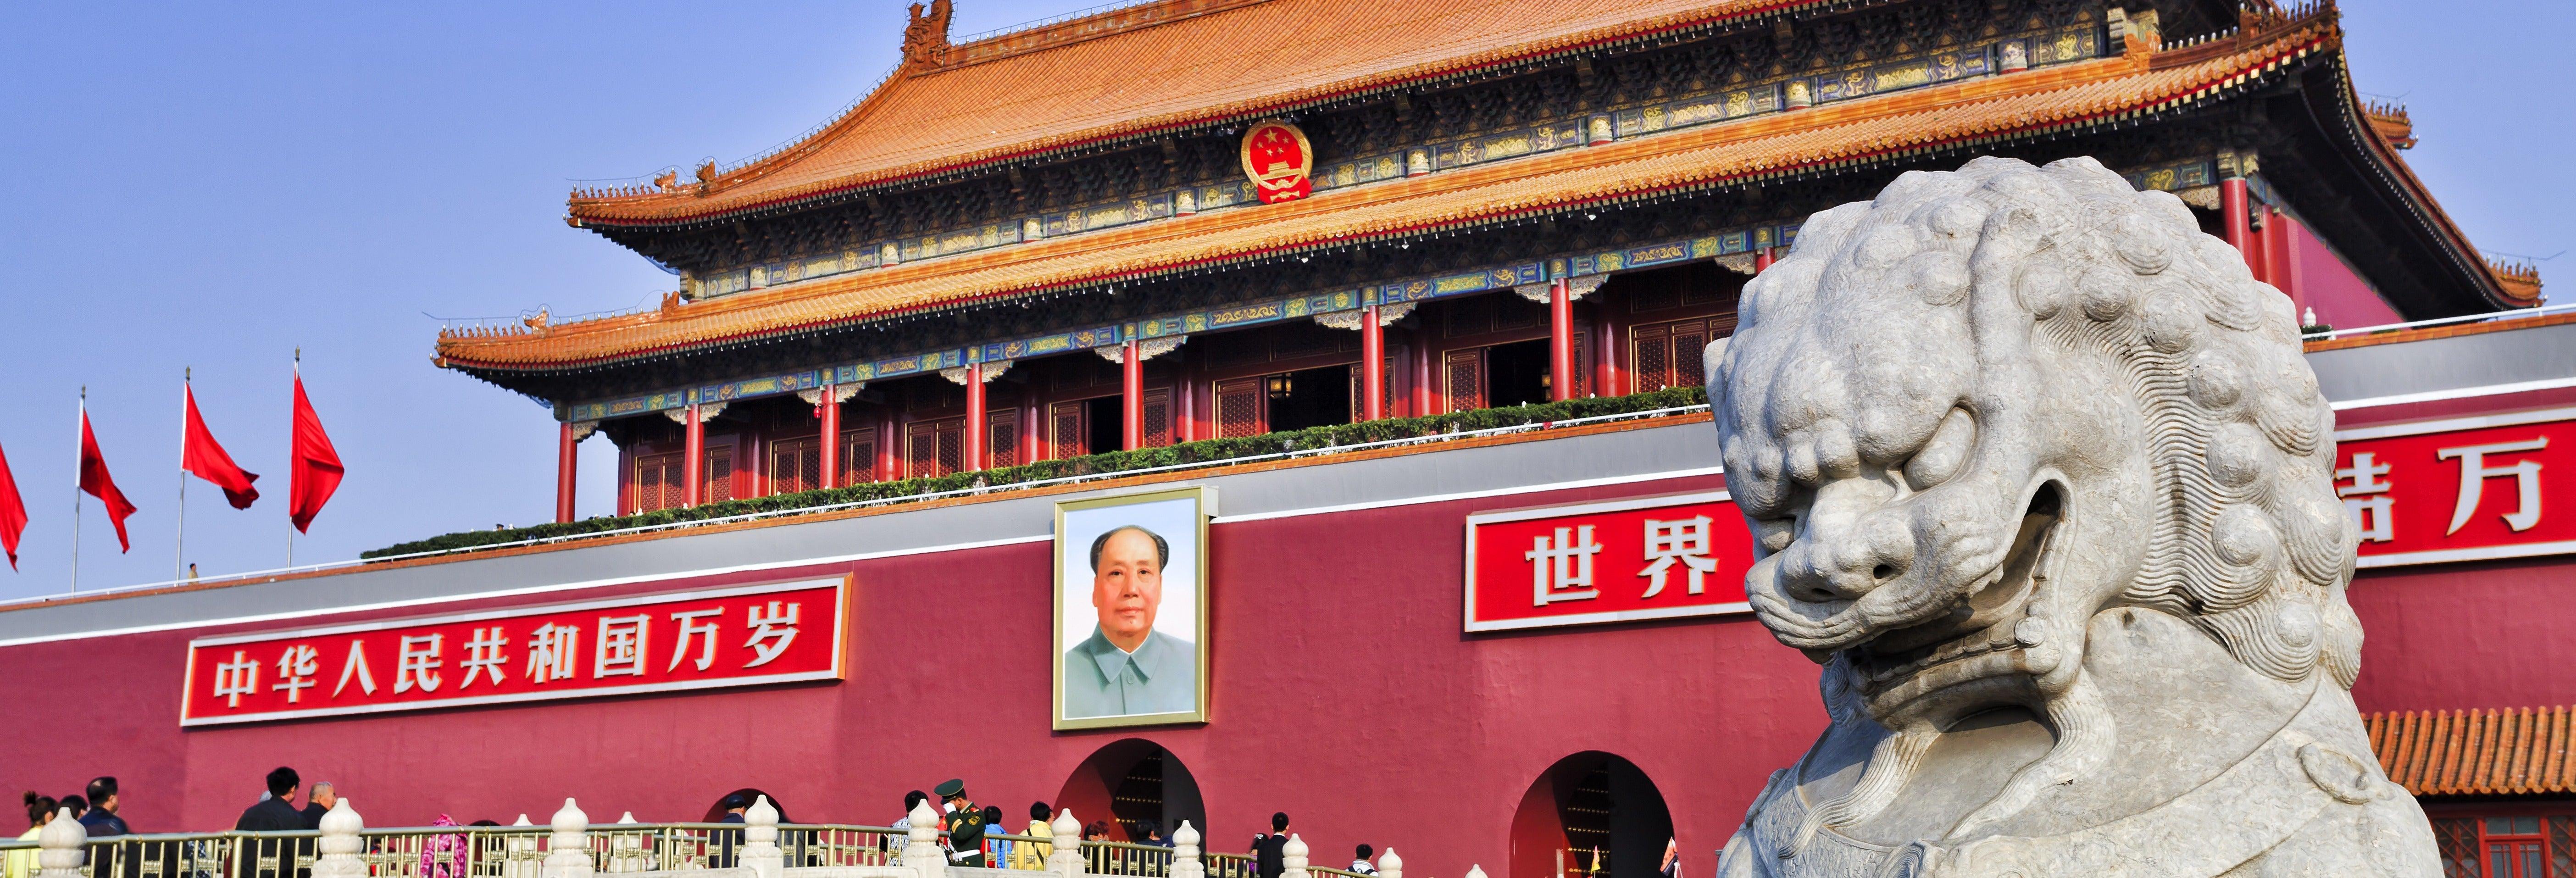 Pékin, Shanghai, Xi'an et Guilin en 12 jours